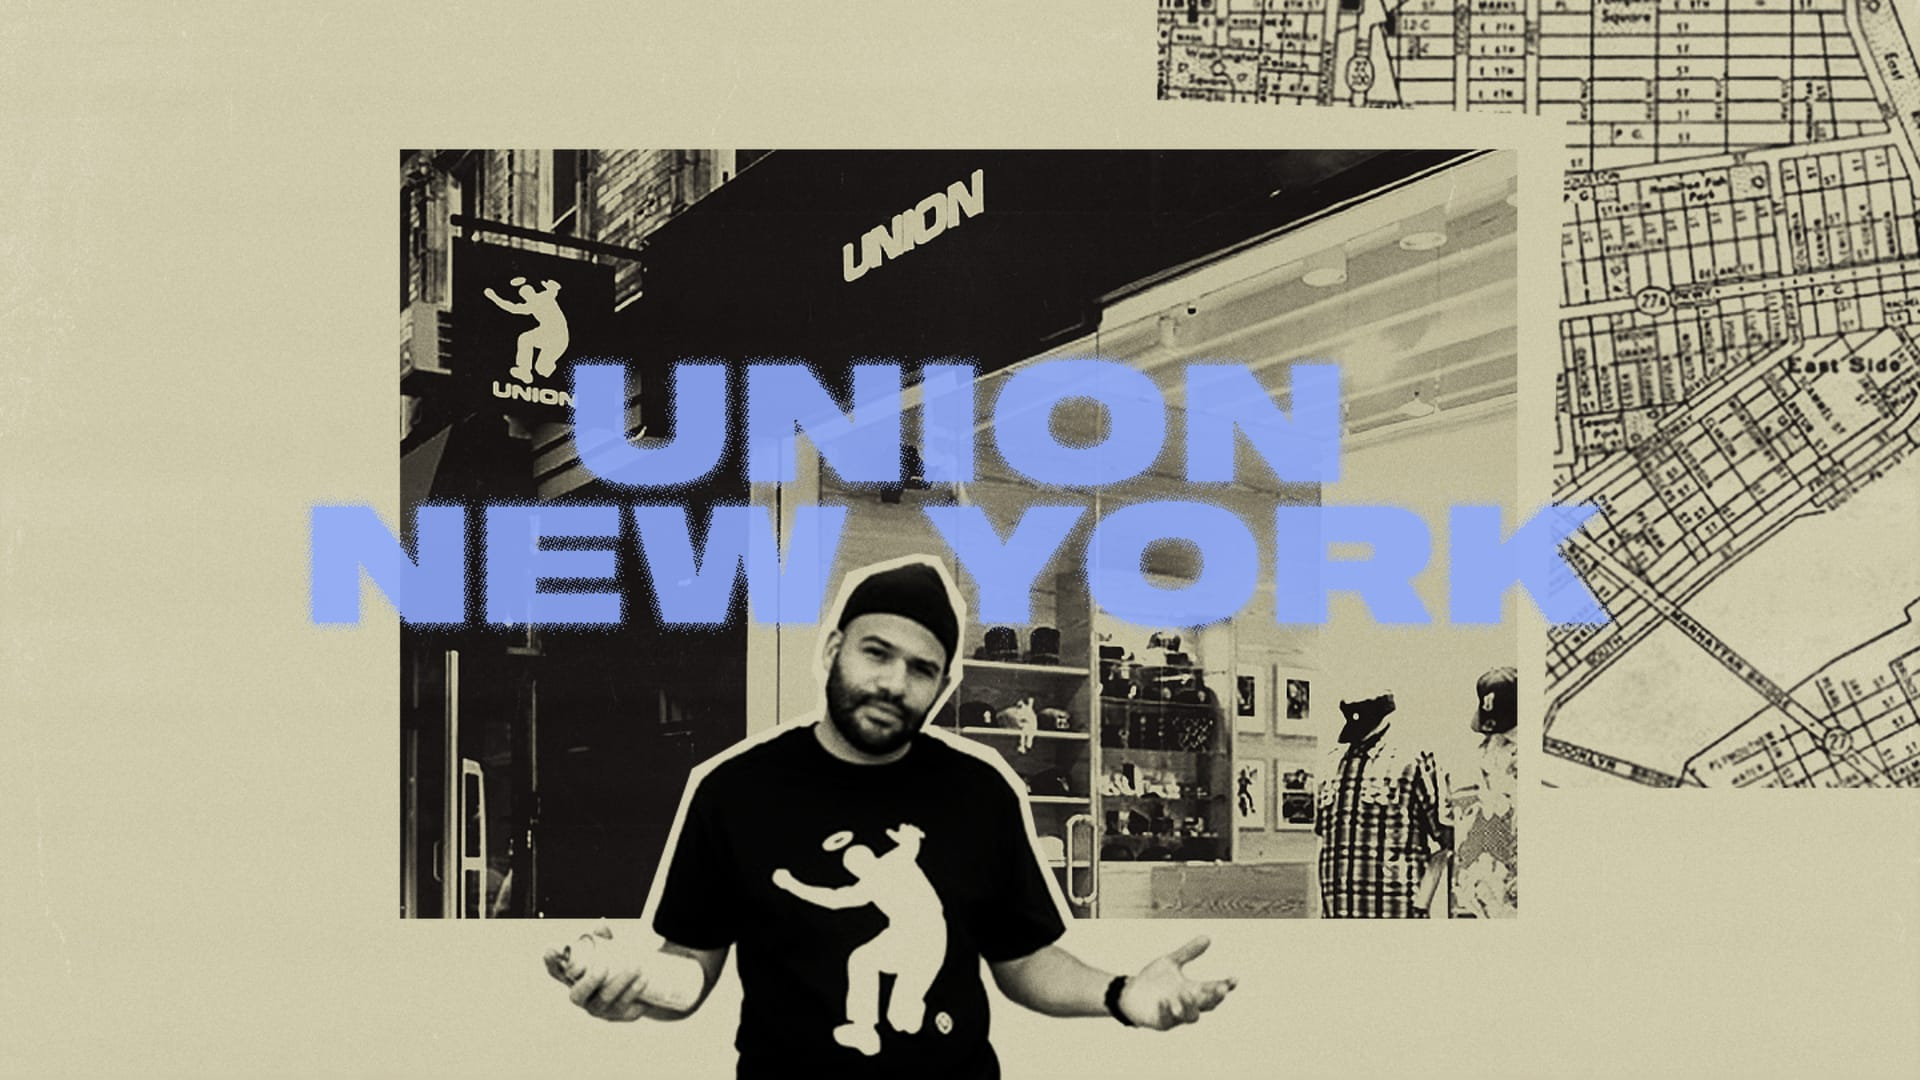 Pioneering Streetwear Stores 'Union'